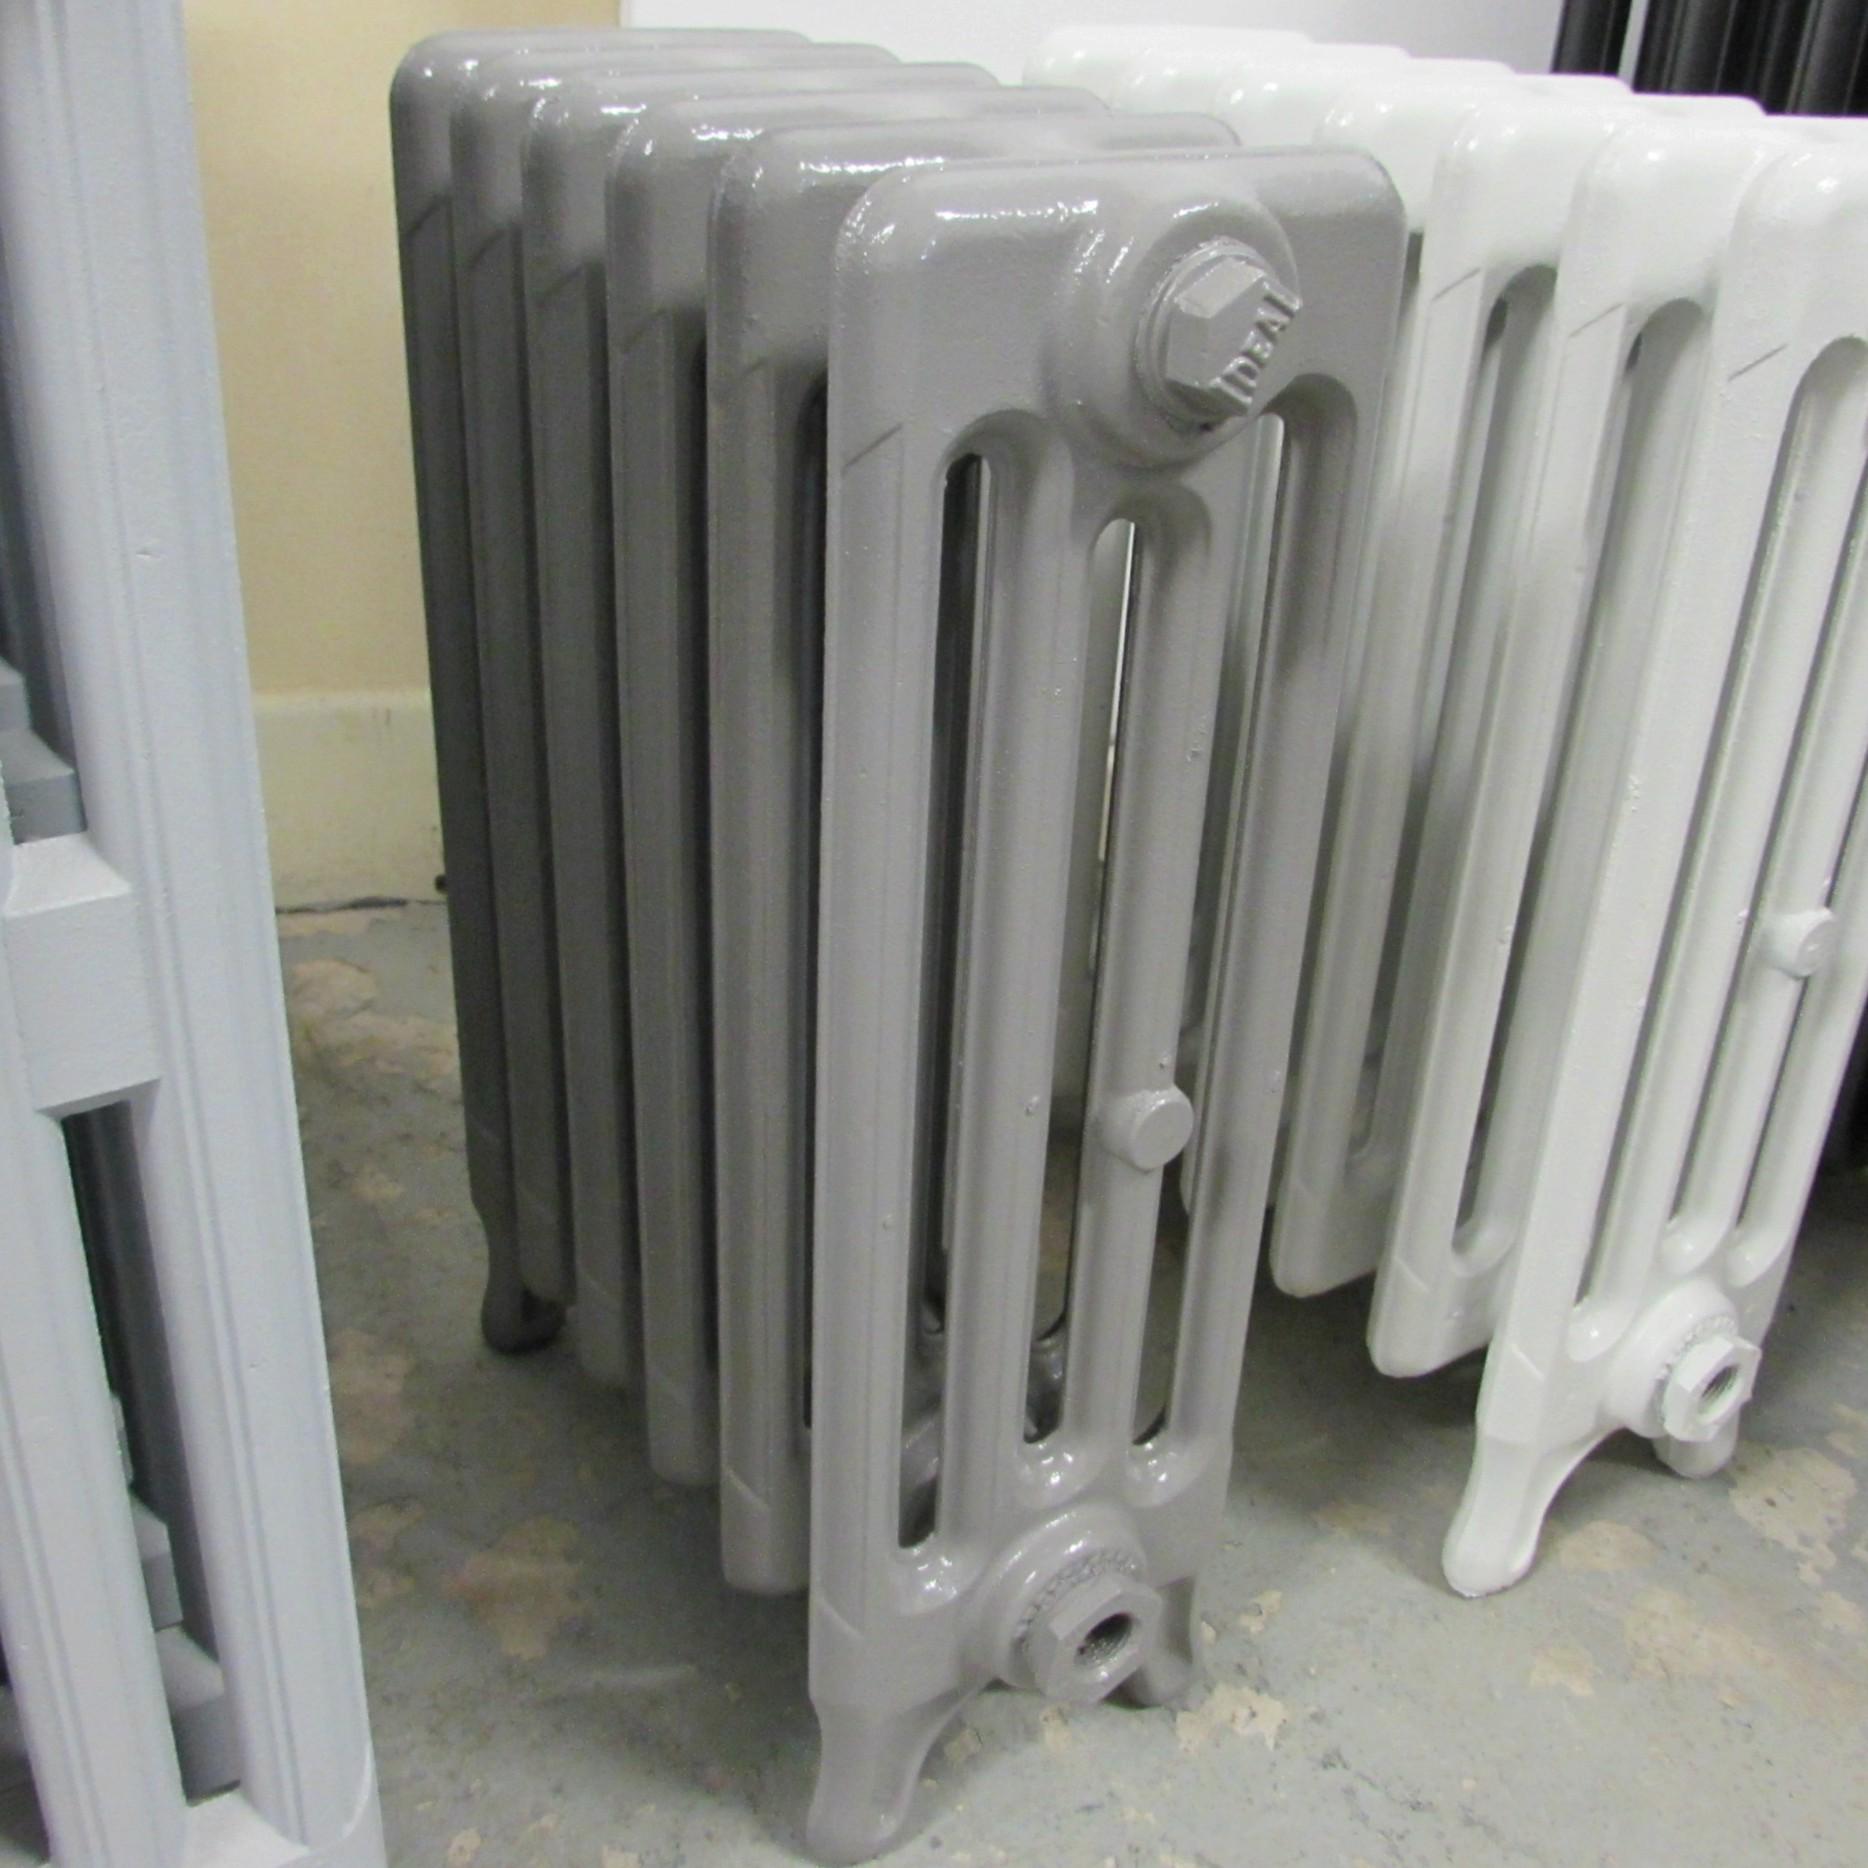 Reclaimed 4 column grey radiator